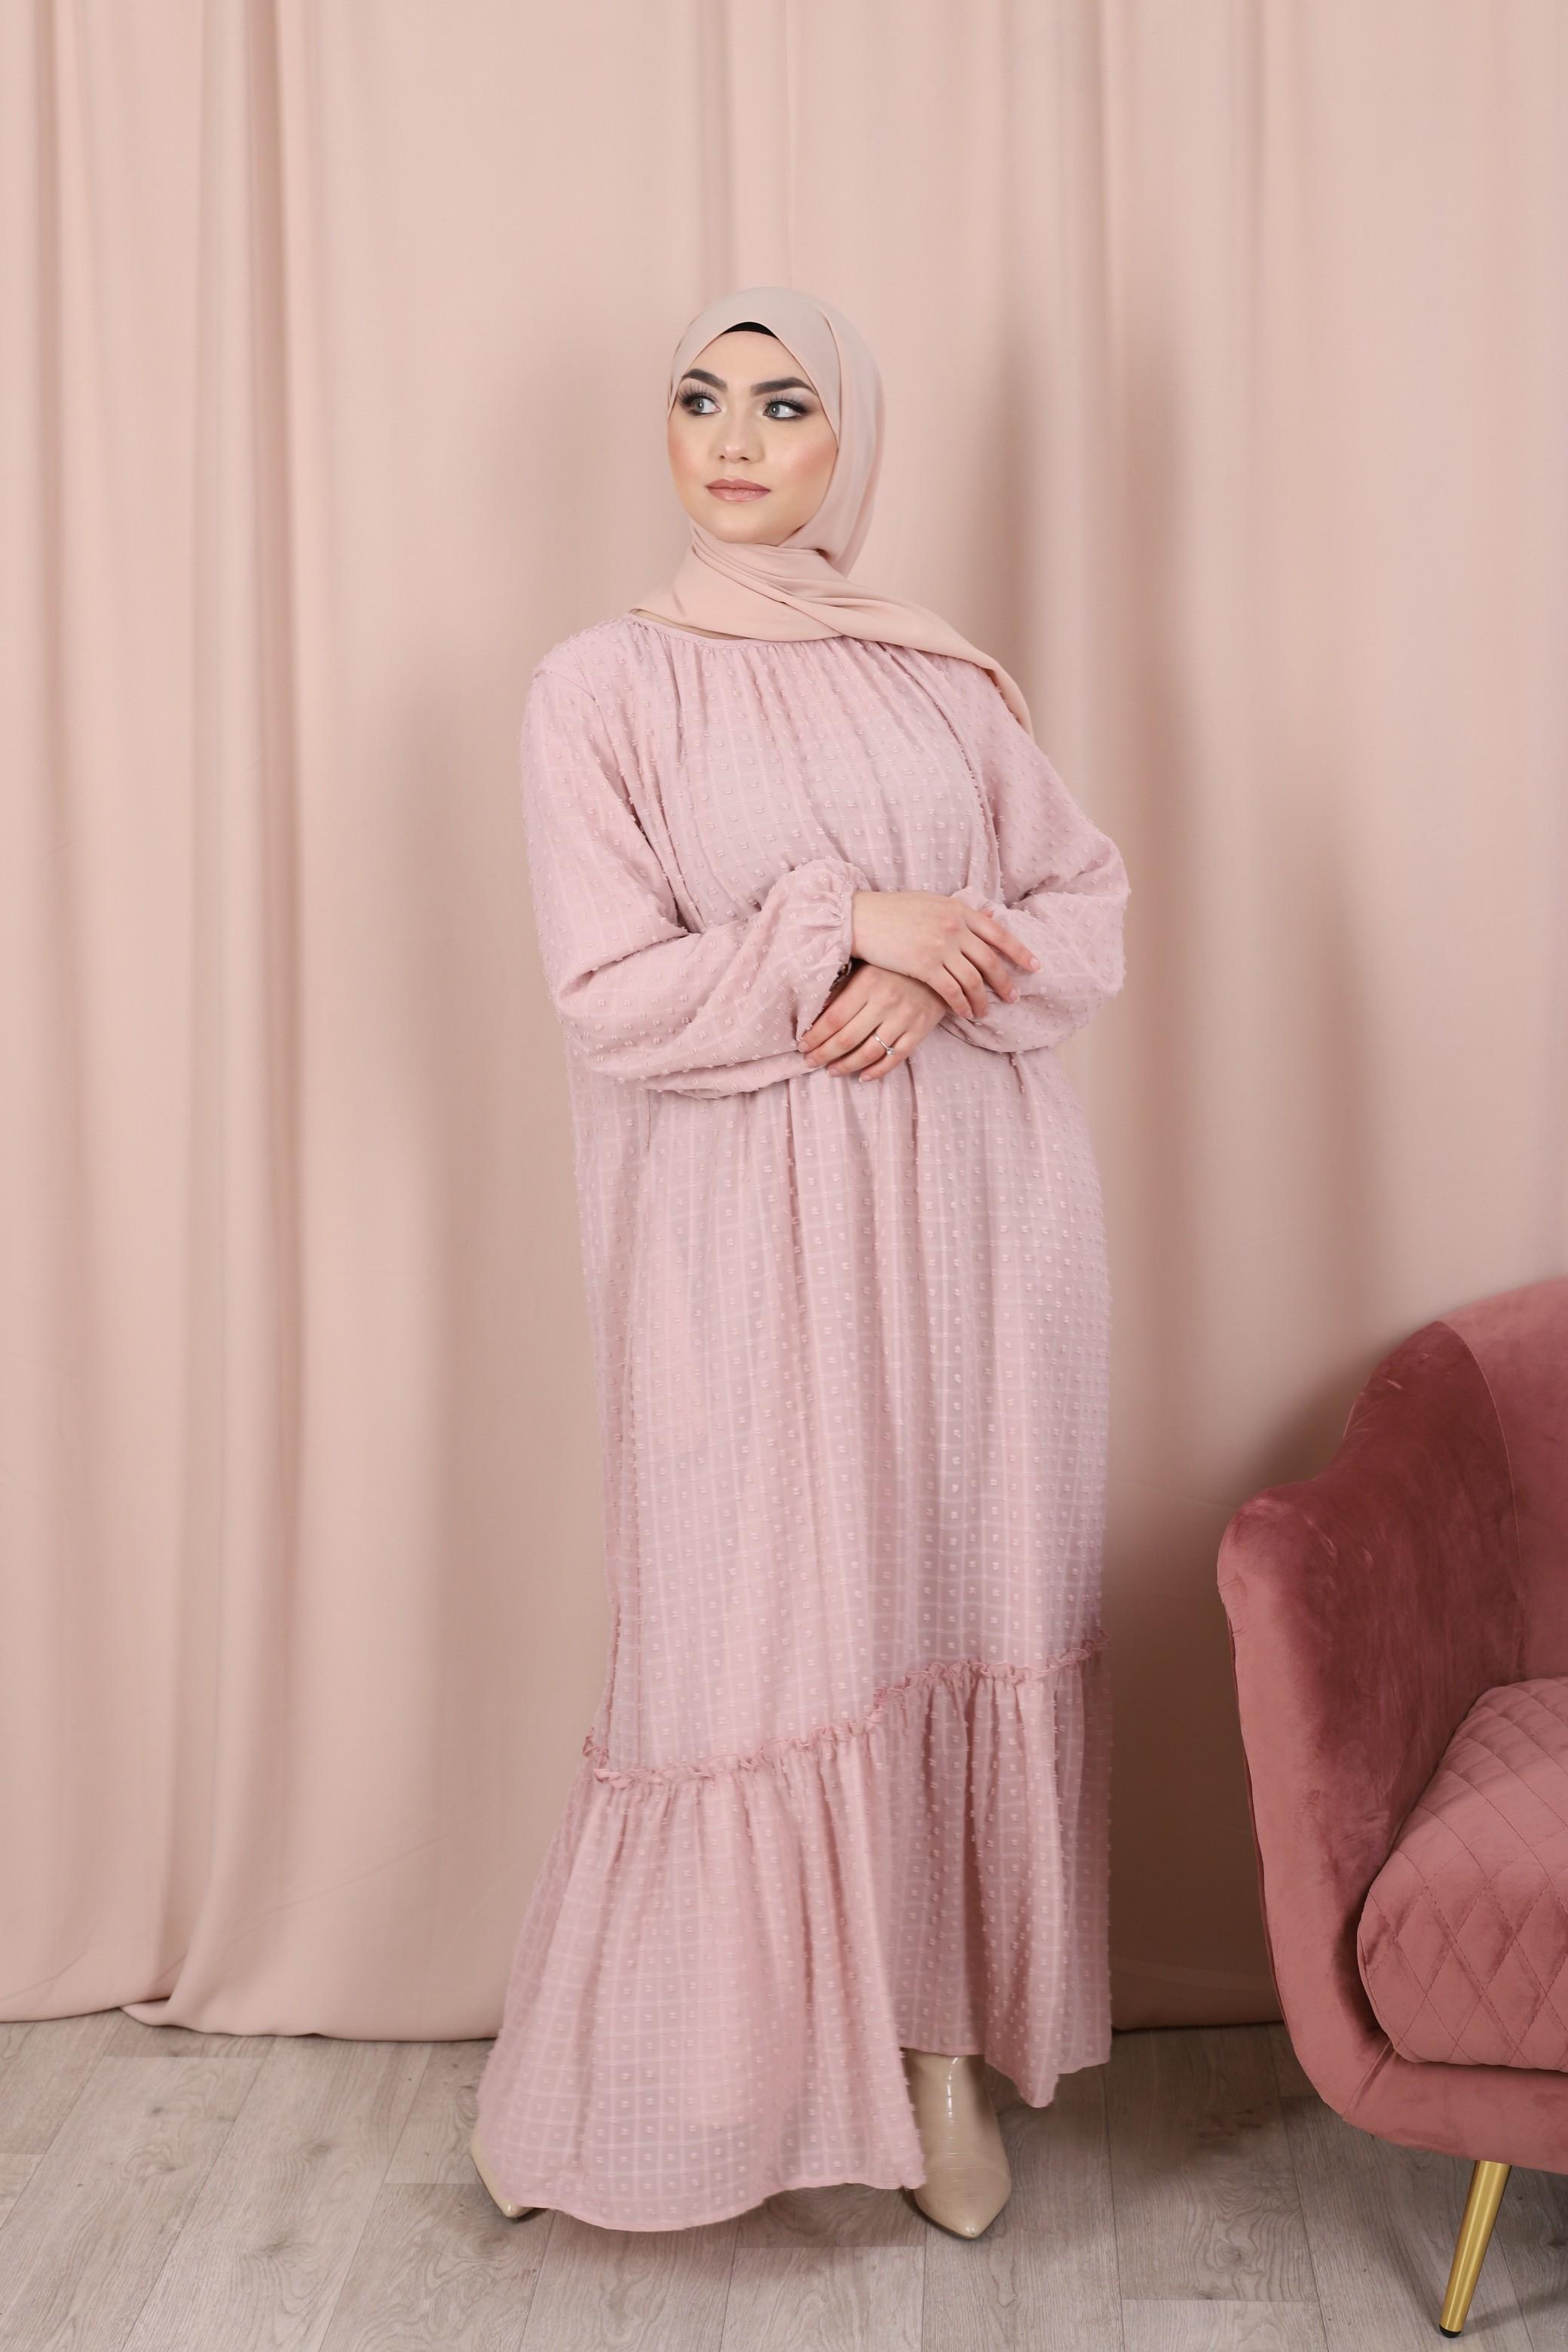 Robe plumetis rose poudré